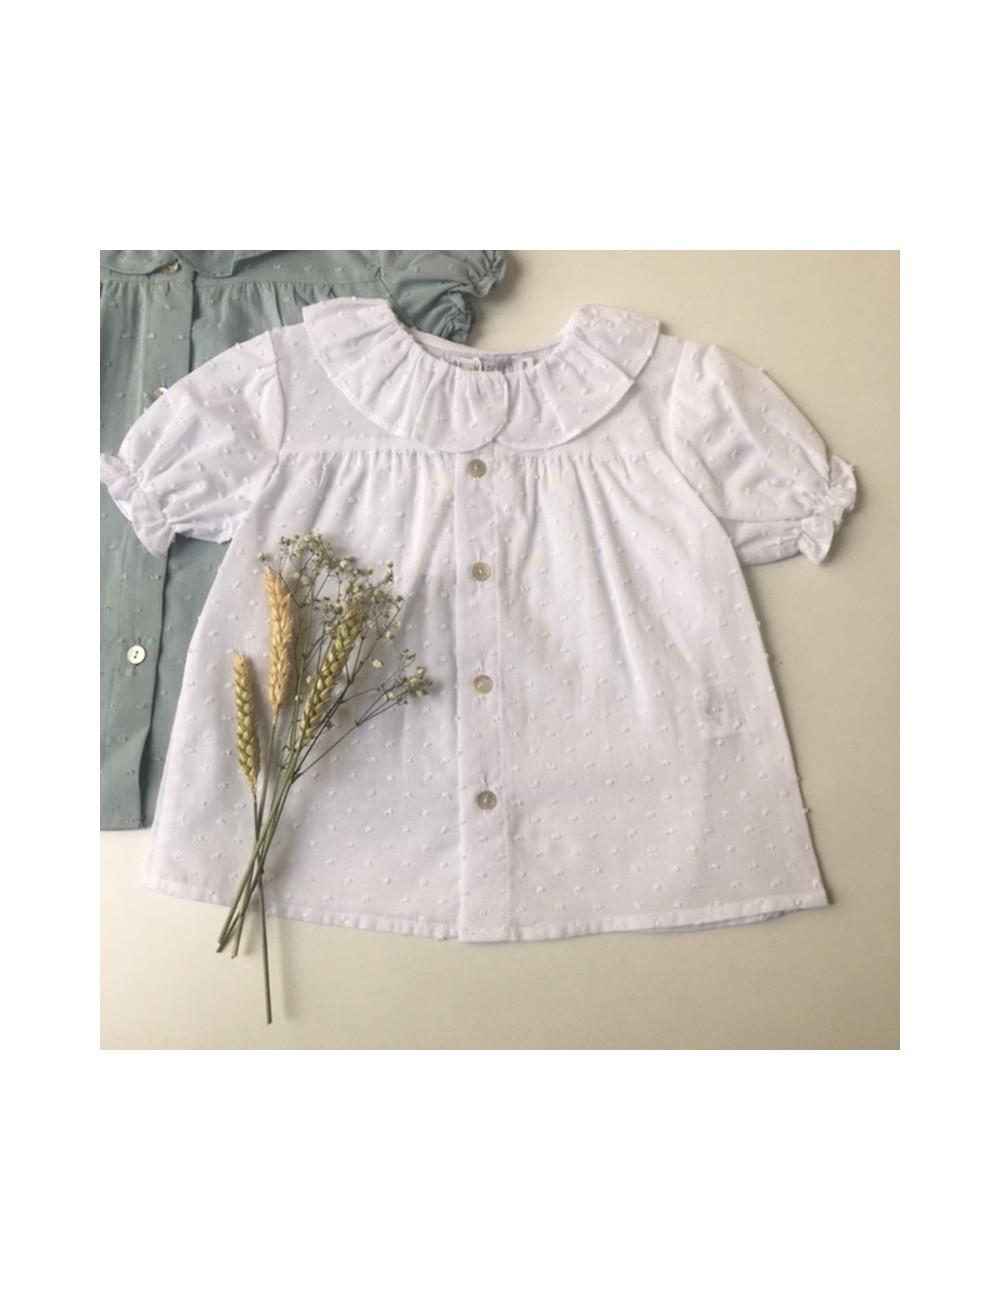 Blusa plumetti blanco cuello de volante de la marca Paloma de la O